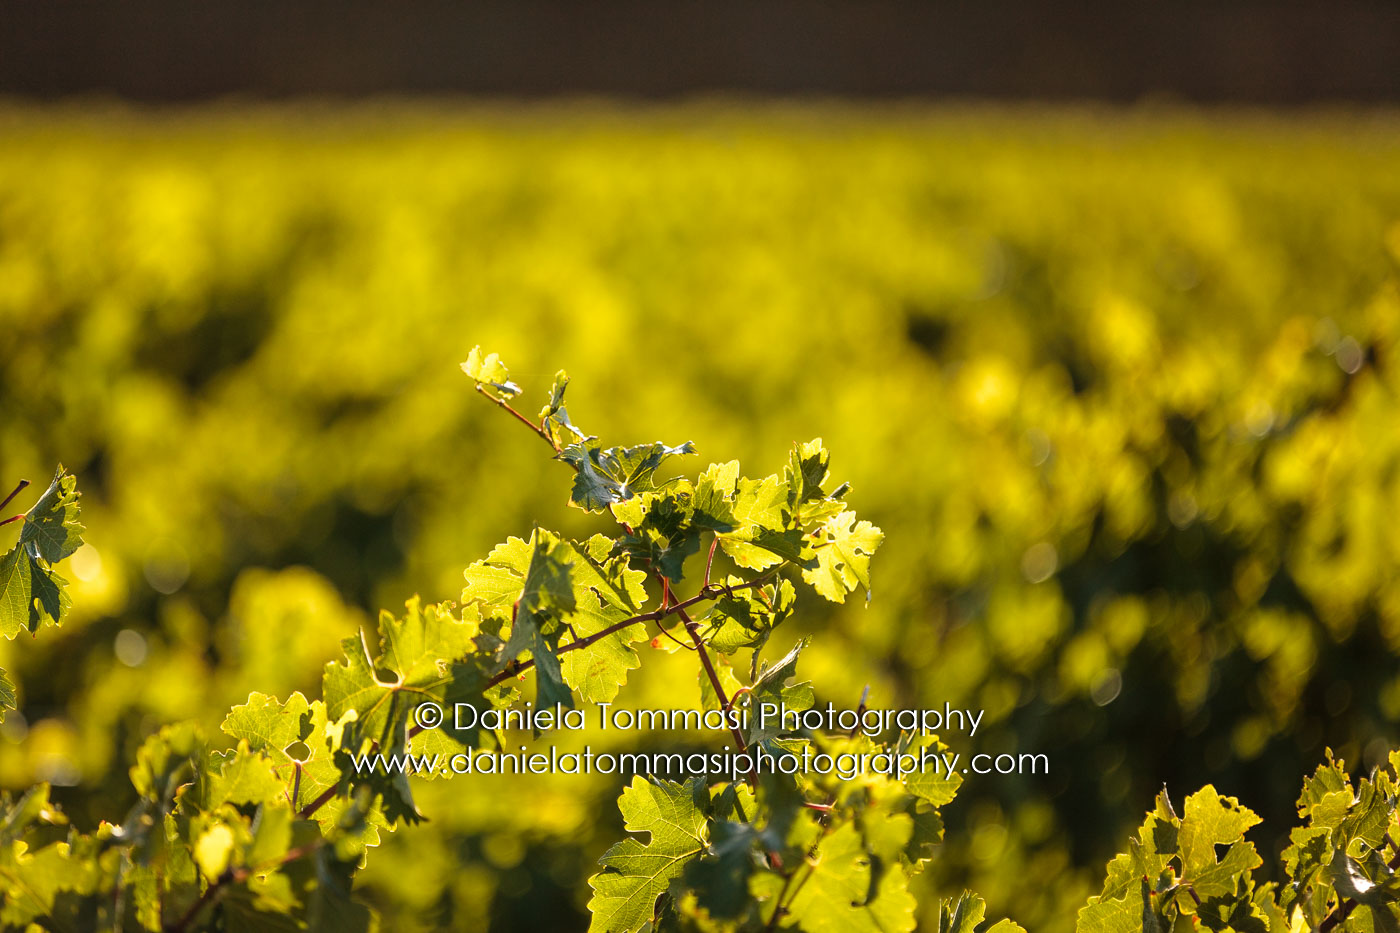 Winery-Daniela Tommasi Photography-4